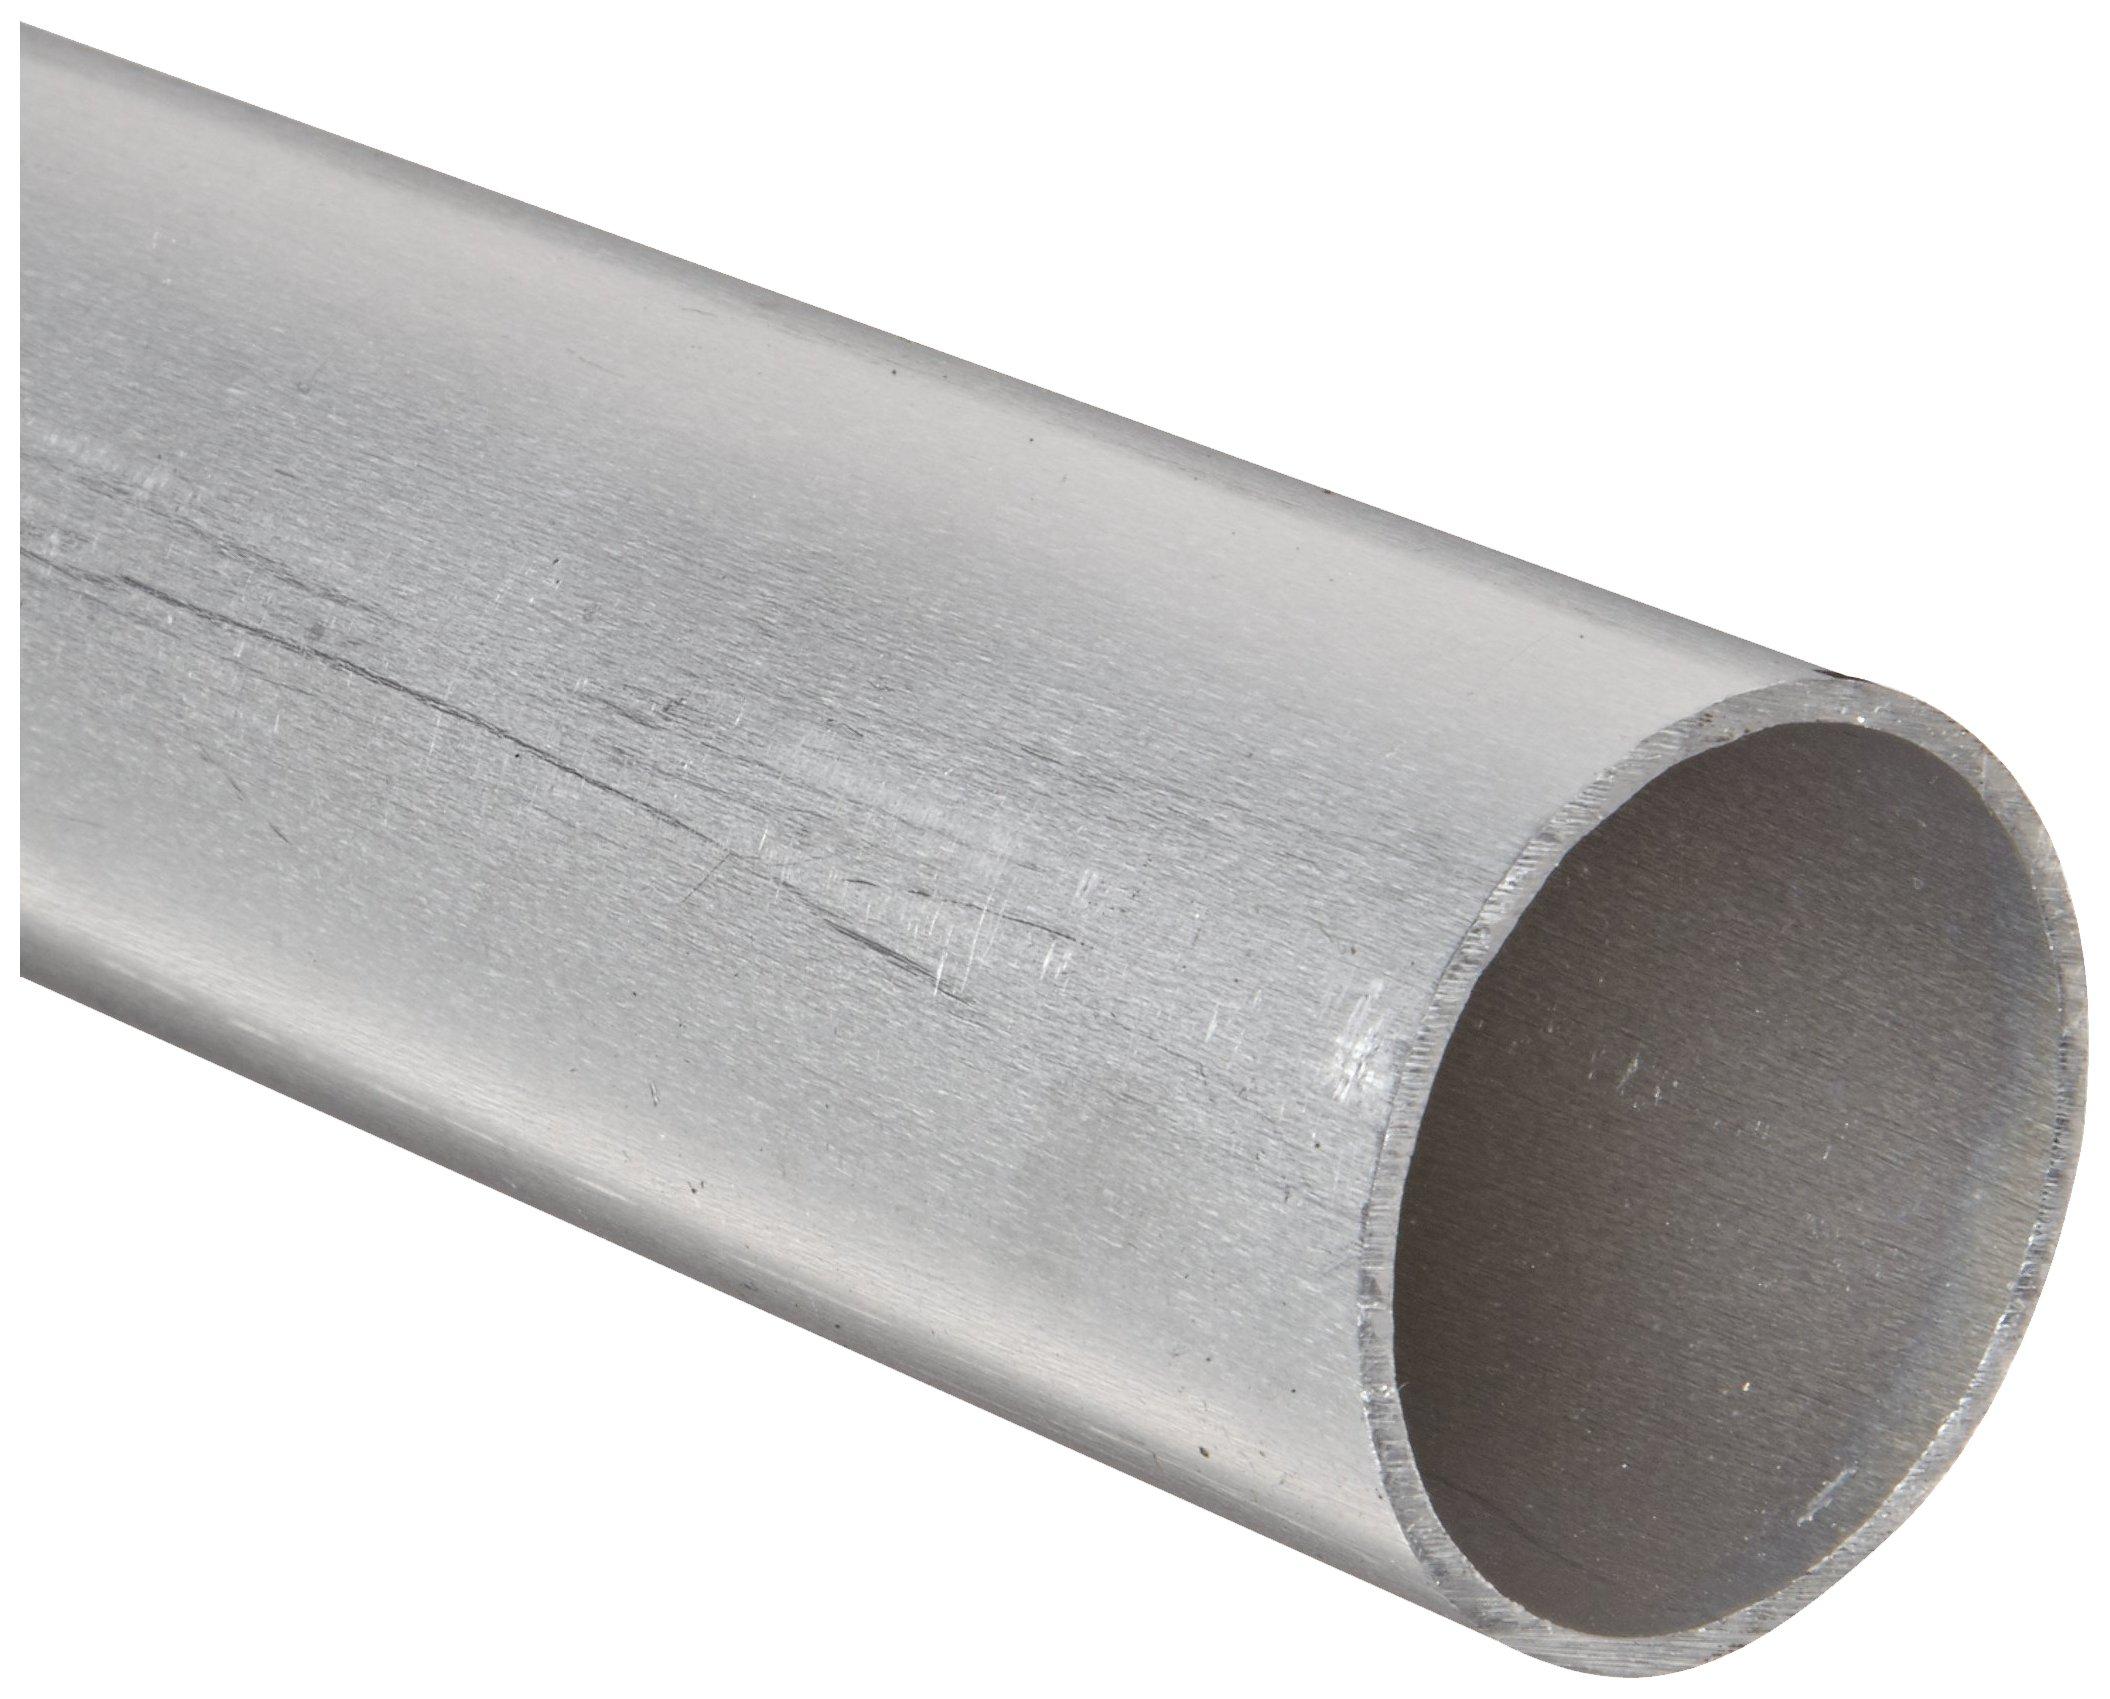 Aluminum 6061-T6 Seamless Round Tubing, WW-T 700/6, 3/4'' OD, 0.68'' ID, 0.035'' Wall, 36'' Length